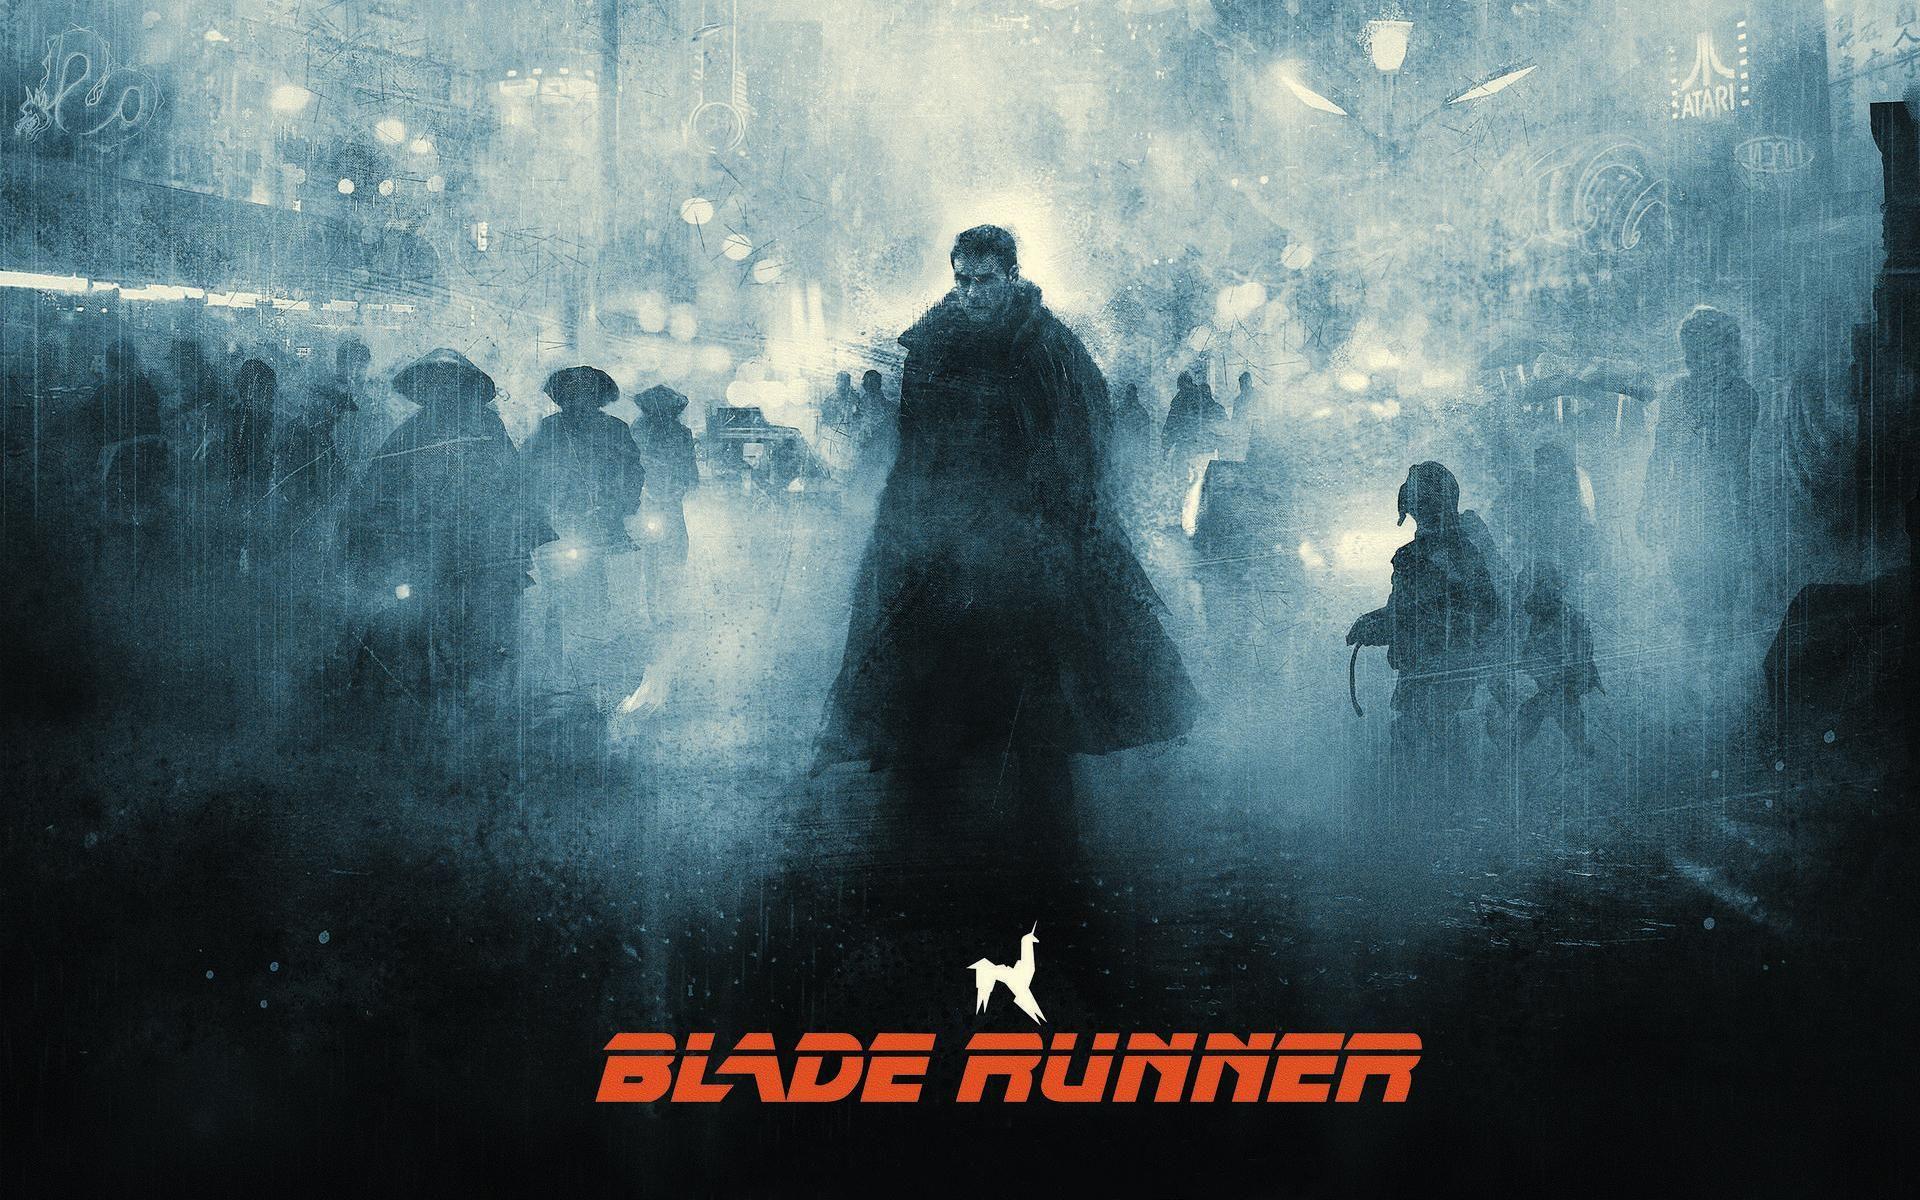 Blade Runner Hd Wallpaper From Gallsourcecom Historia